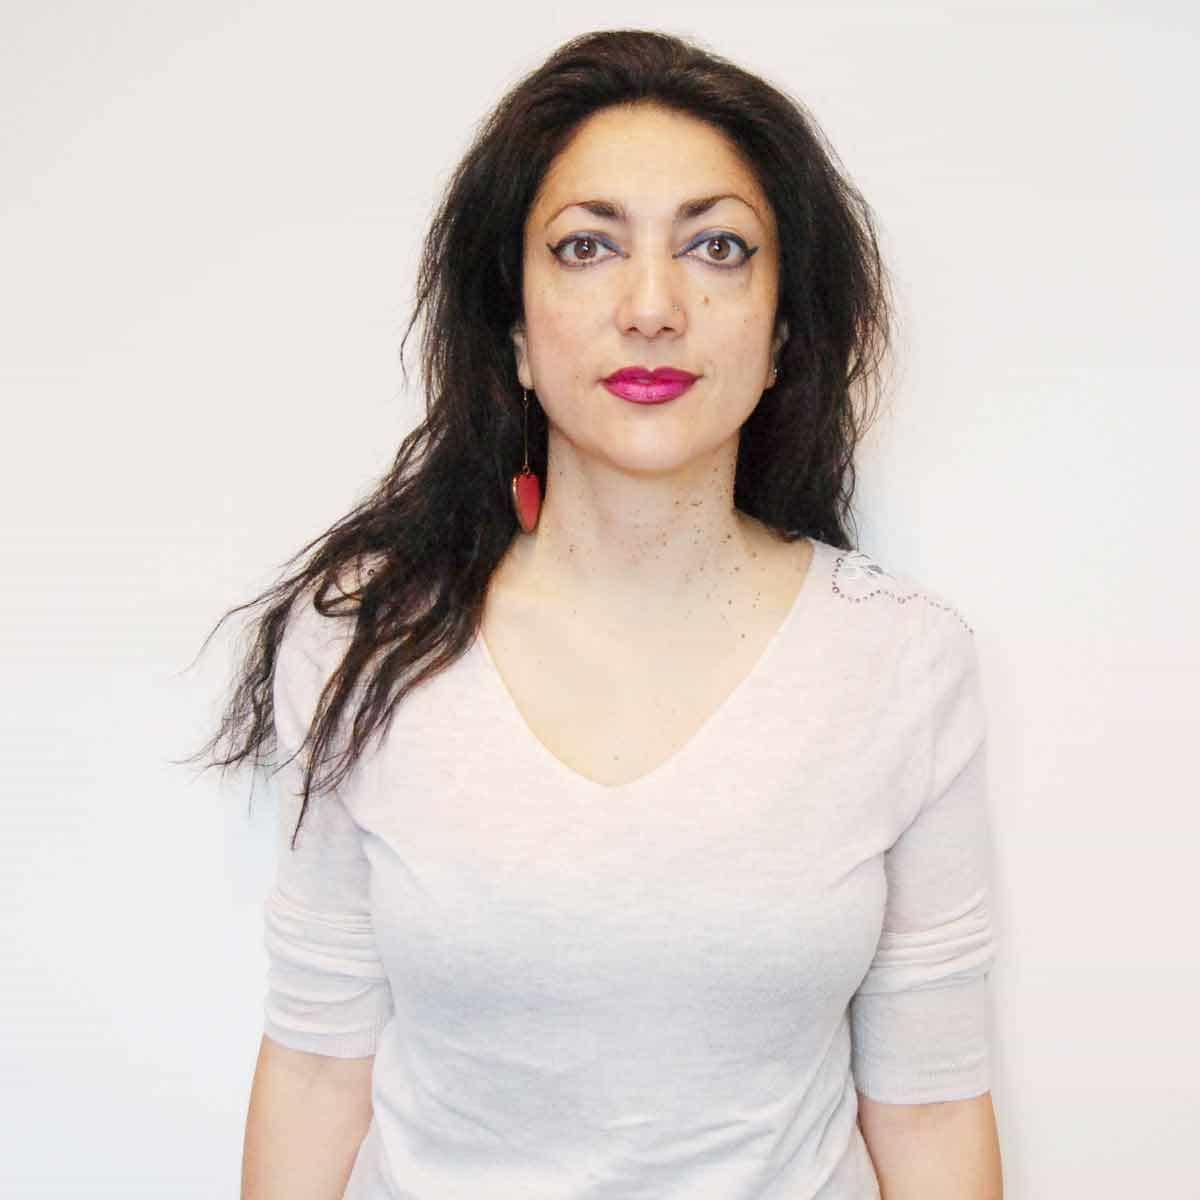 Eleonora Strangis